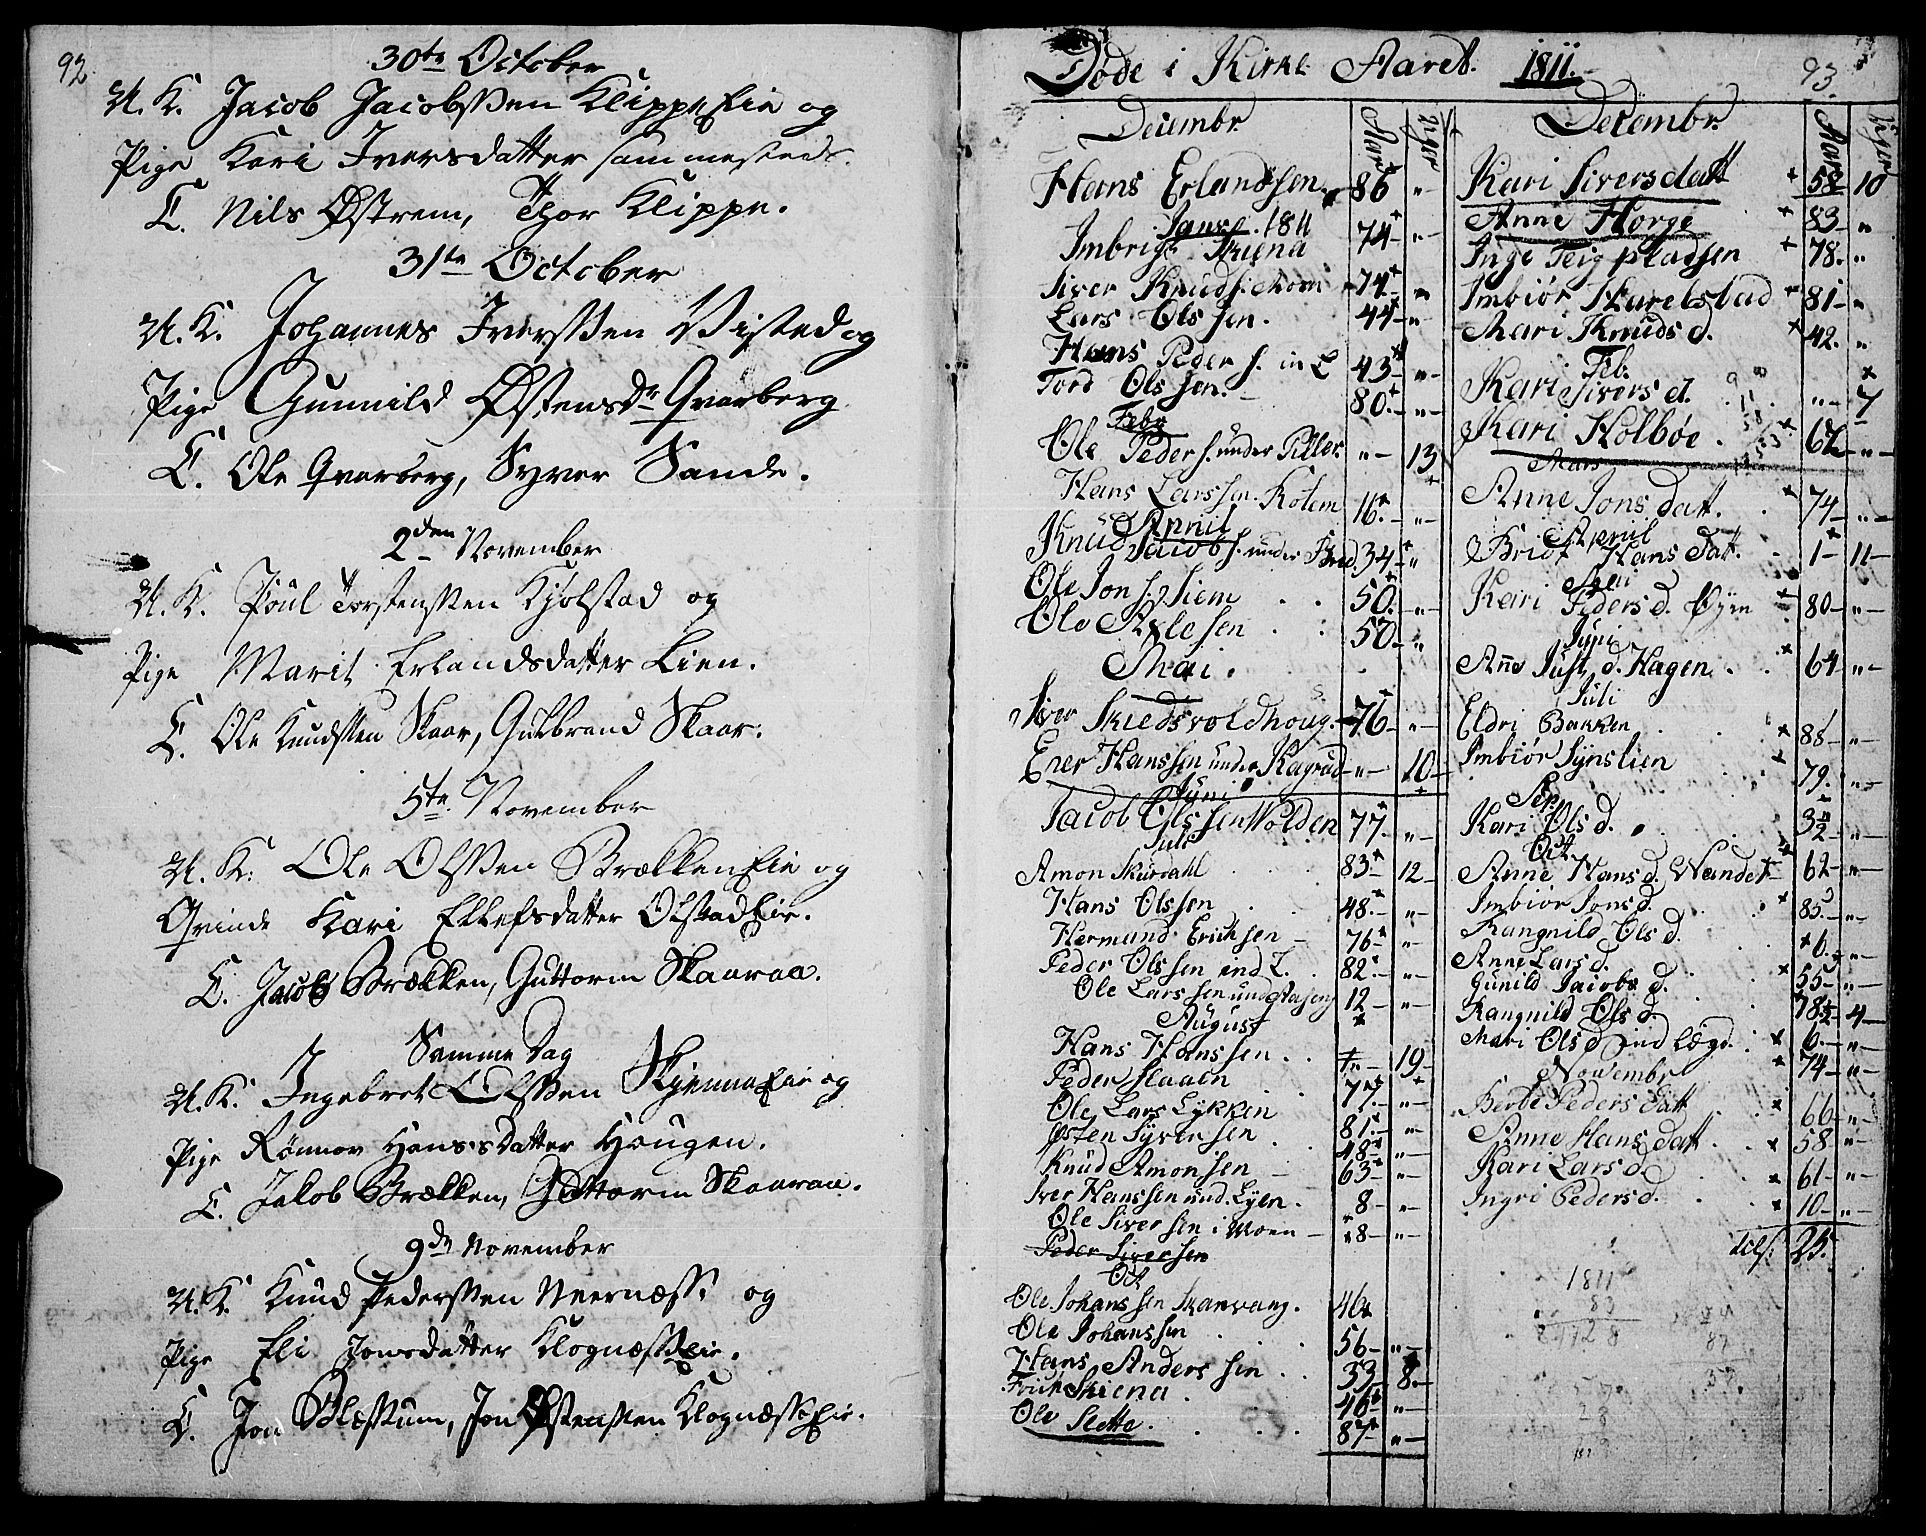 SAH, Vågå prestekontor, Ministerialbok nr. 2, 1810-1815, s. 92-93